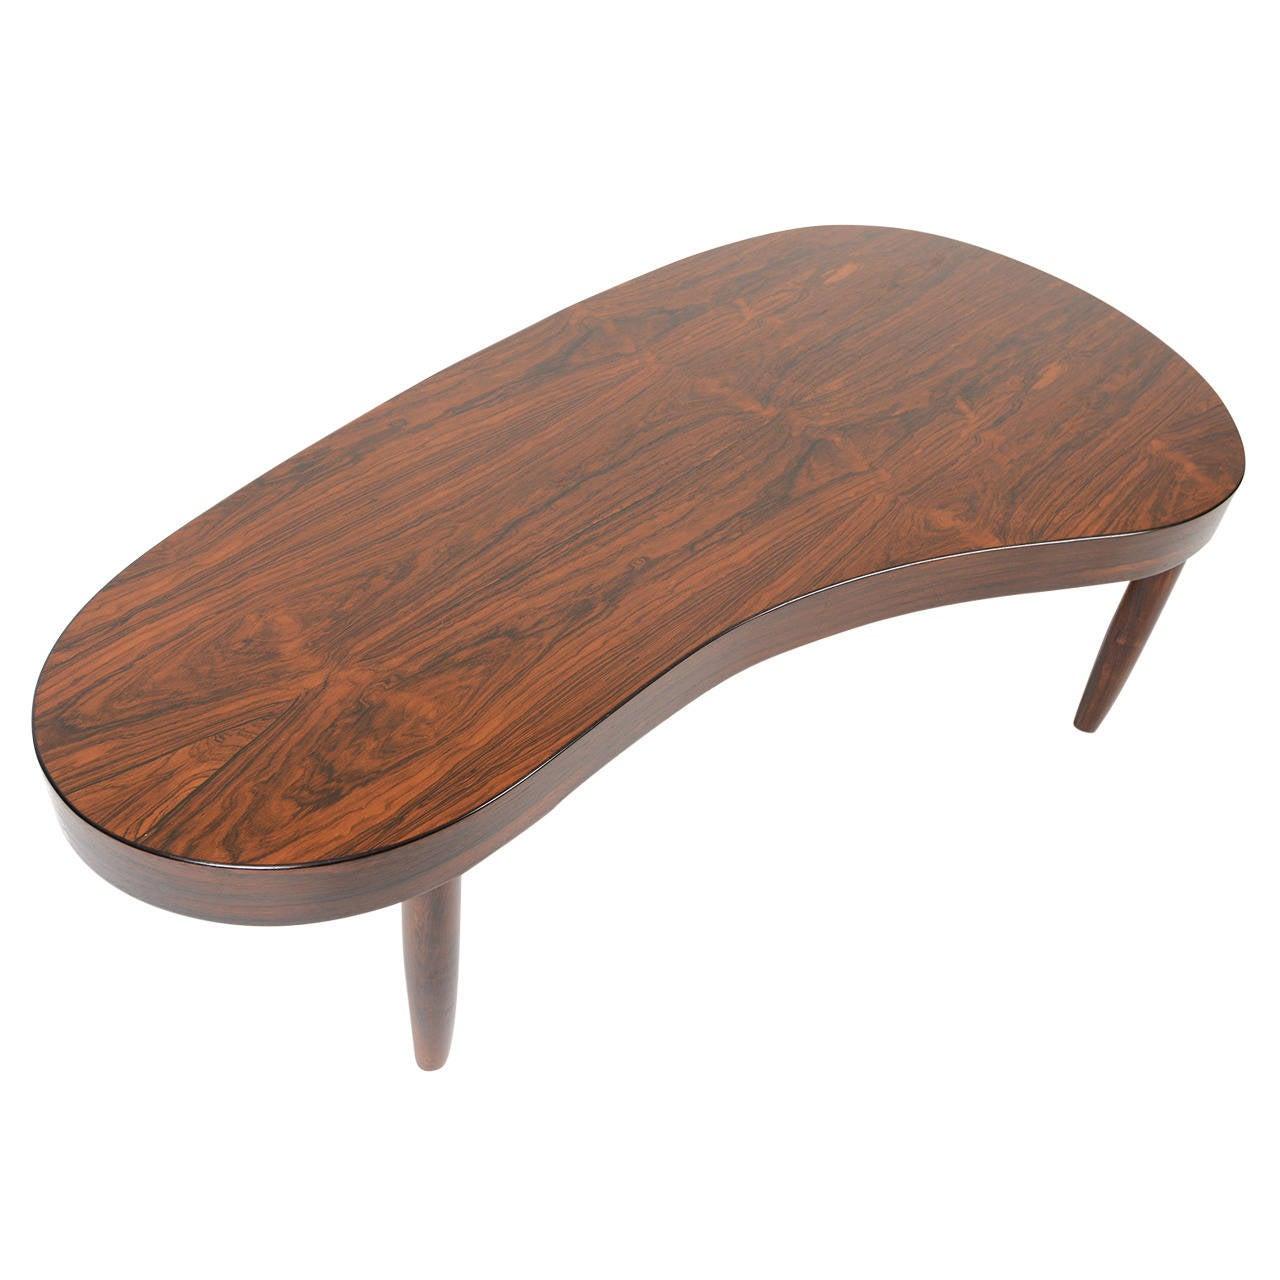 Danish Modern Biomorphic Rosewood Coffee Table At 1stdibs